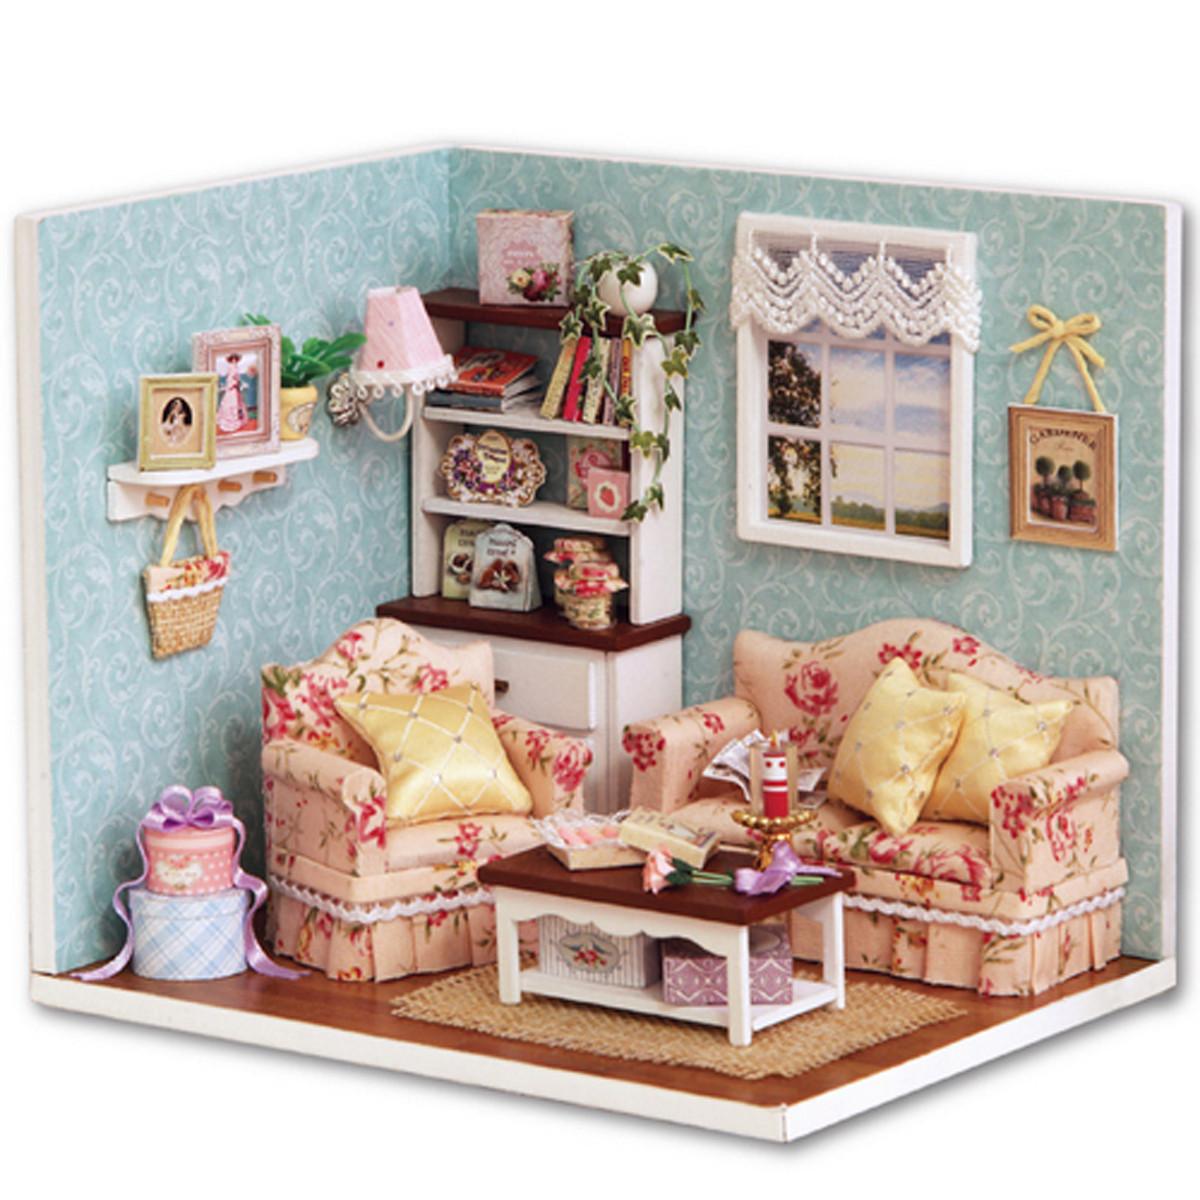 Dollhouse Miniatures Diy: Dollhouse Miniature DIY Kit Happy Time Room With Cover